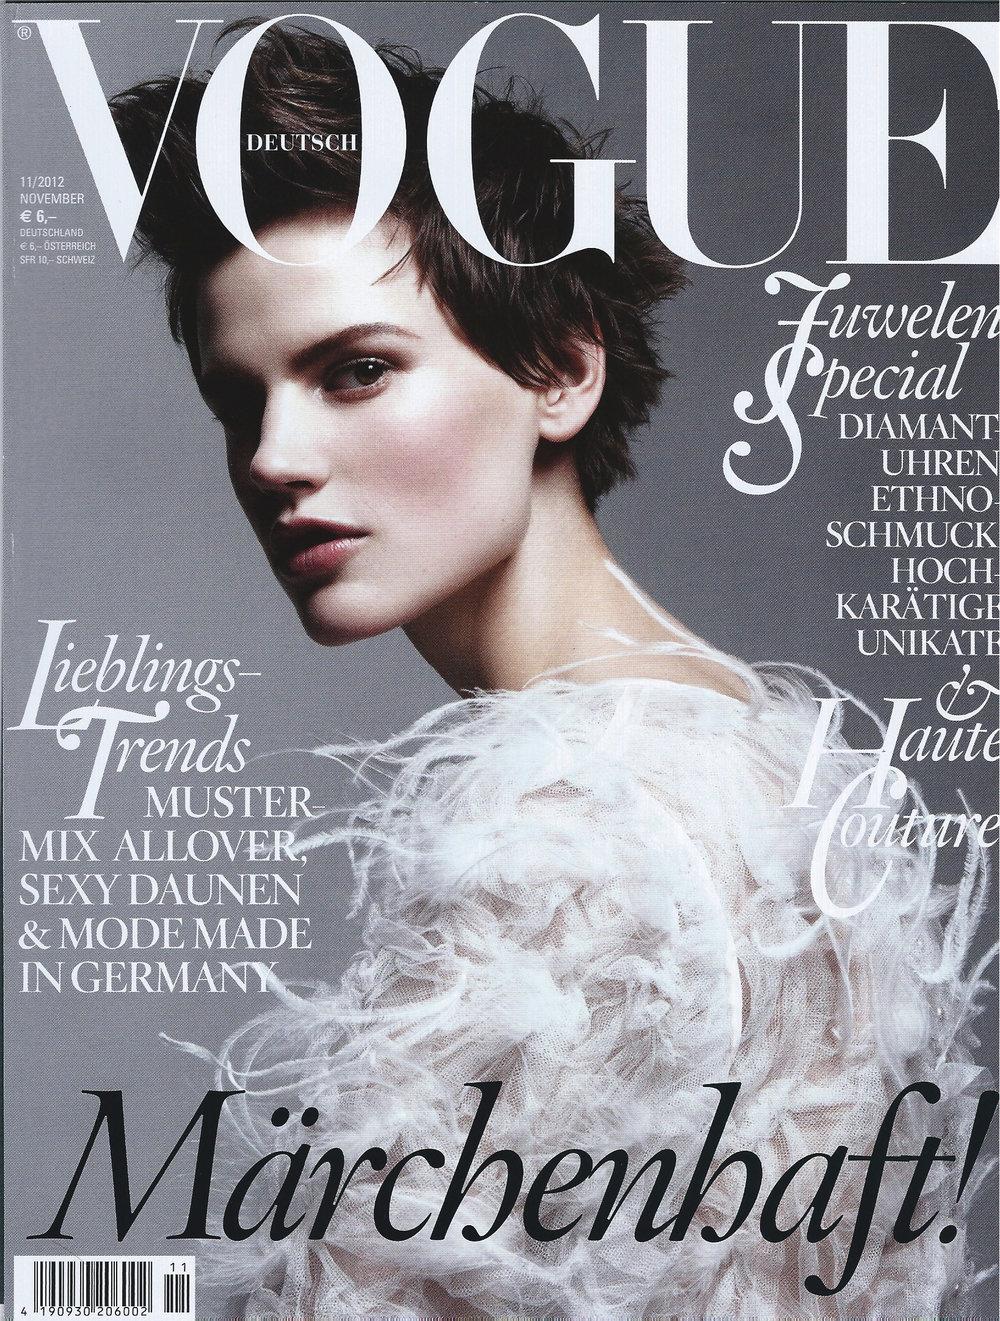 Dan Jackson - German Vogue Cover Nov 2012.jpg